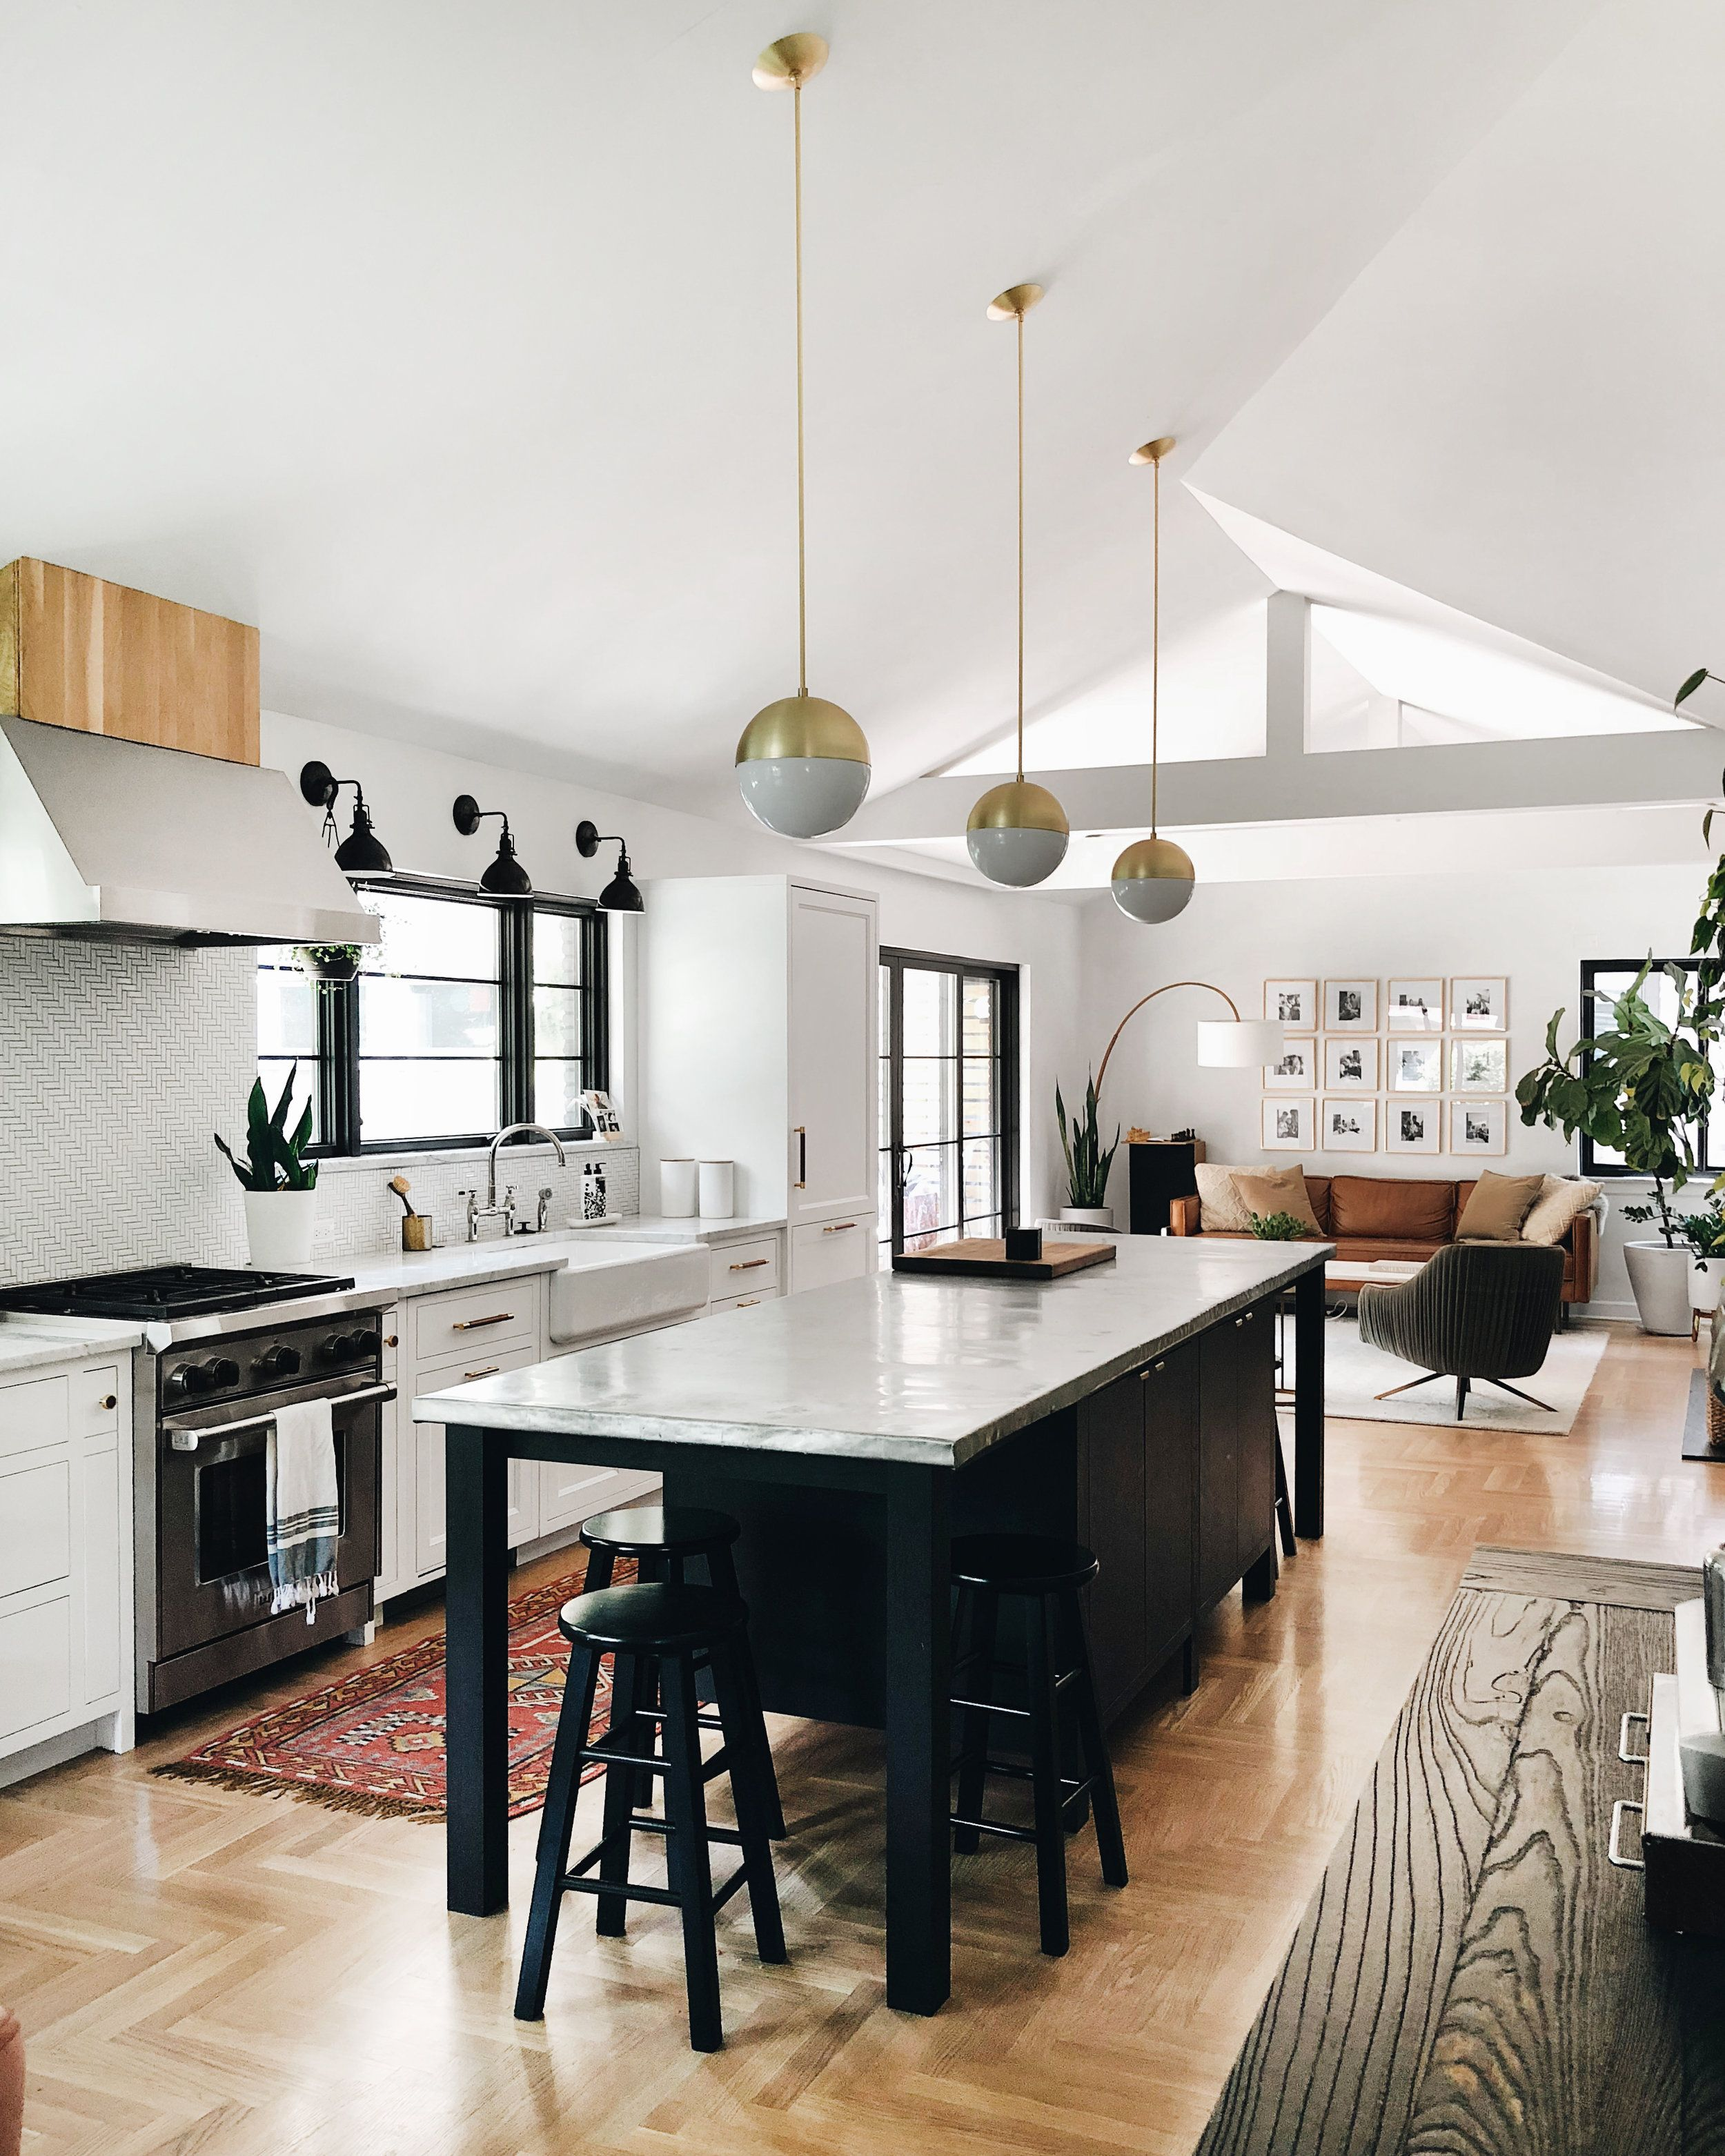 3d548b3b 555a 4d6f A430 8601b9b065bb Jpg Kitchen Inspirations Industrial Decor Kitchen Kitchen Without Island